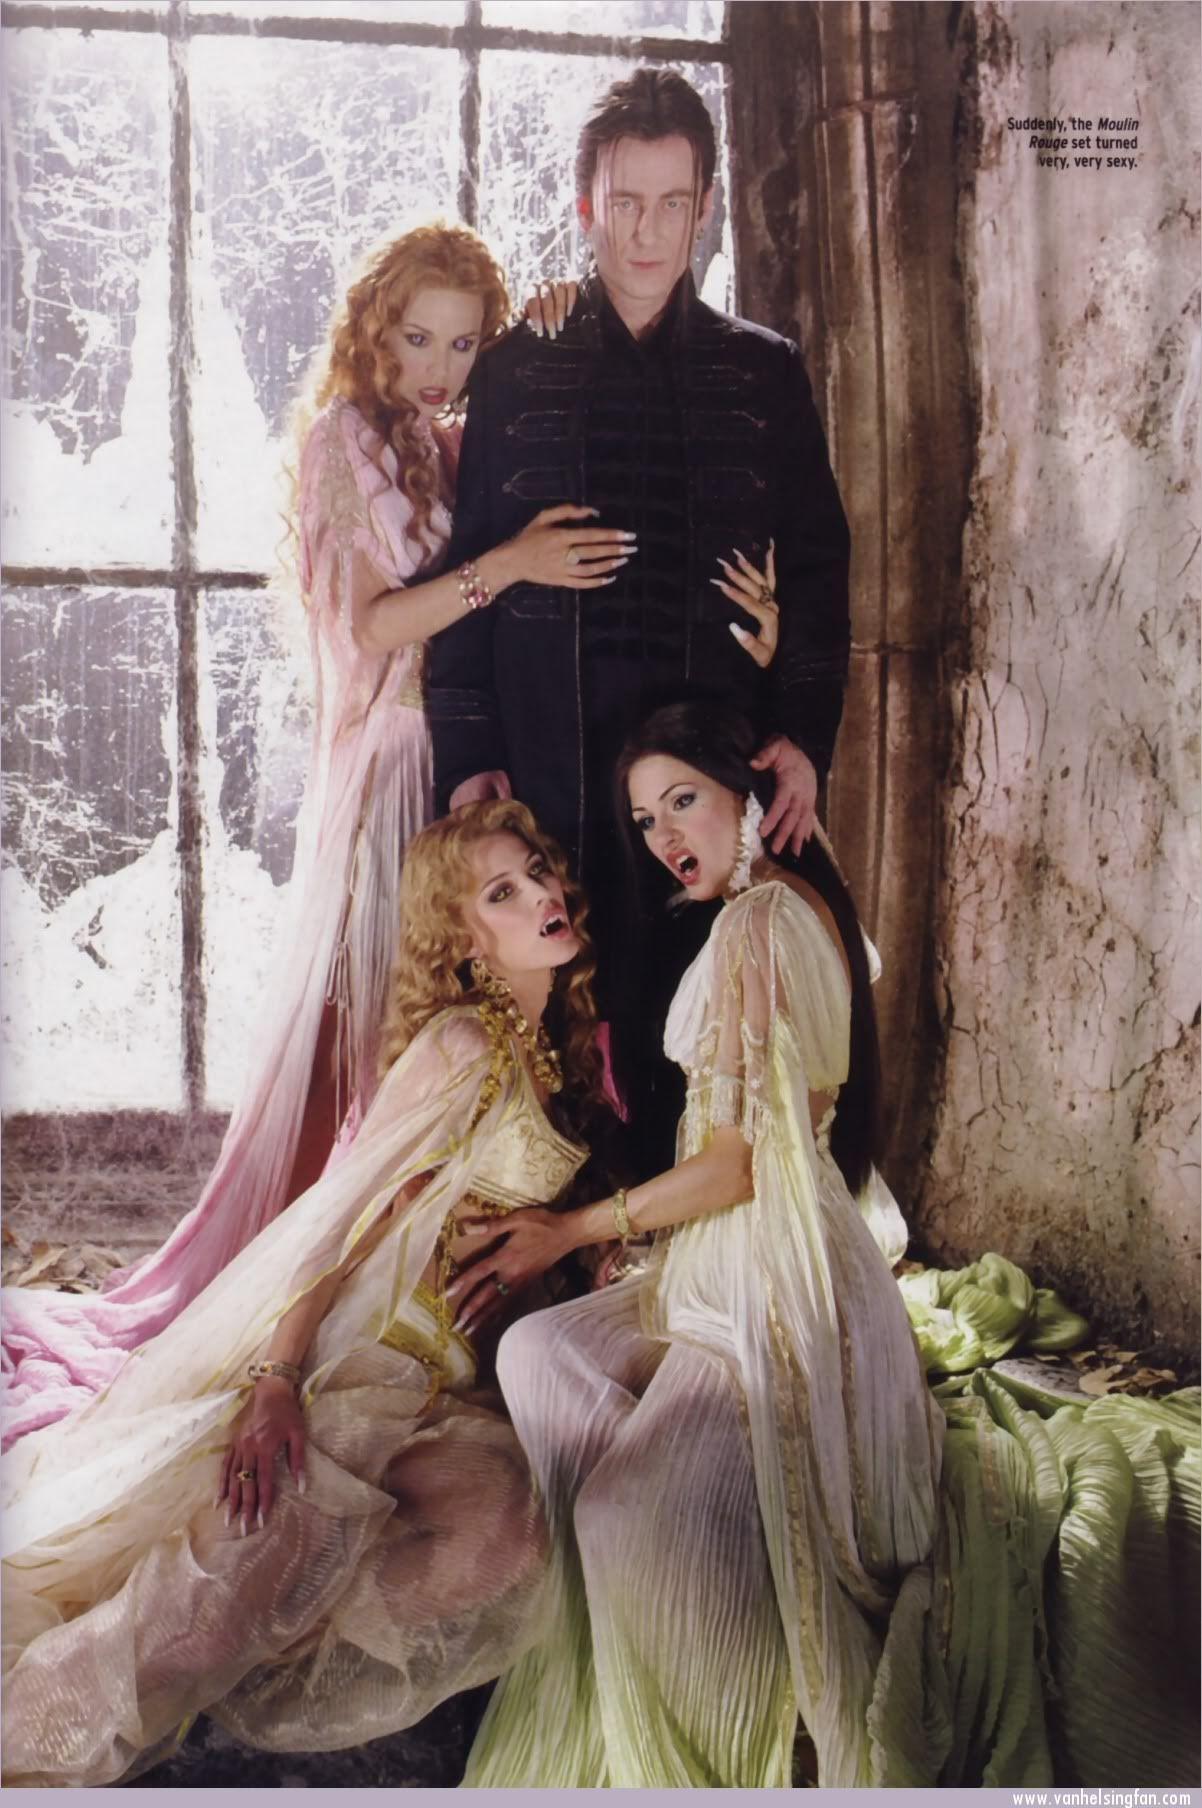 photo: The Brides Nbc